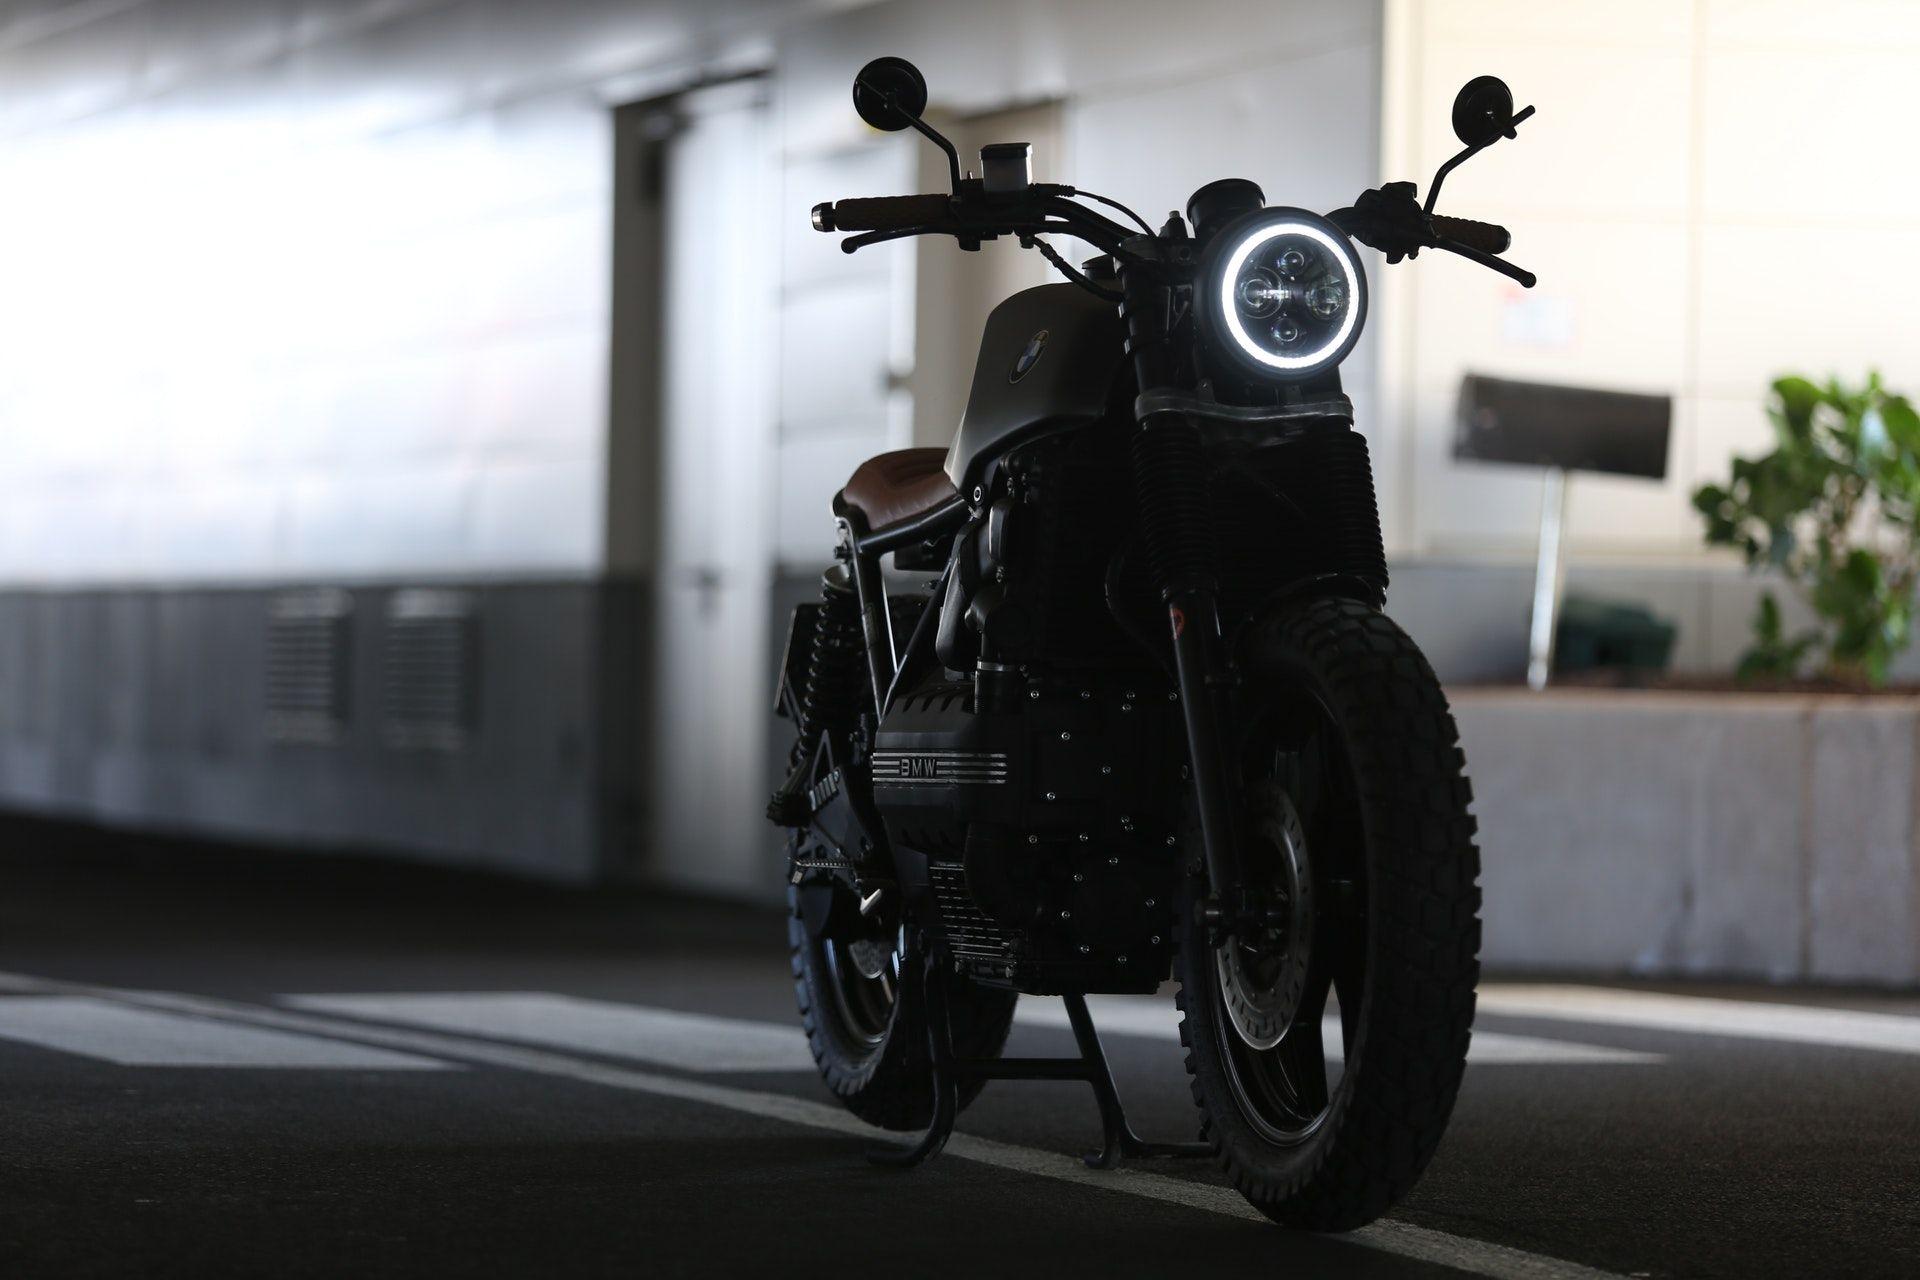 عکس زمینه موتورسیکلت پارک شده پس زمینه